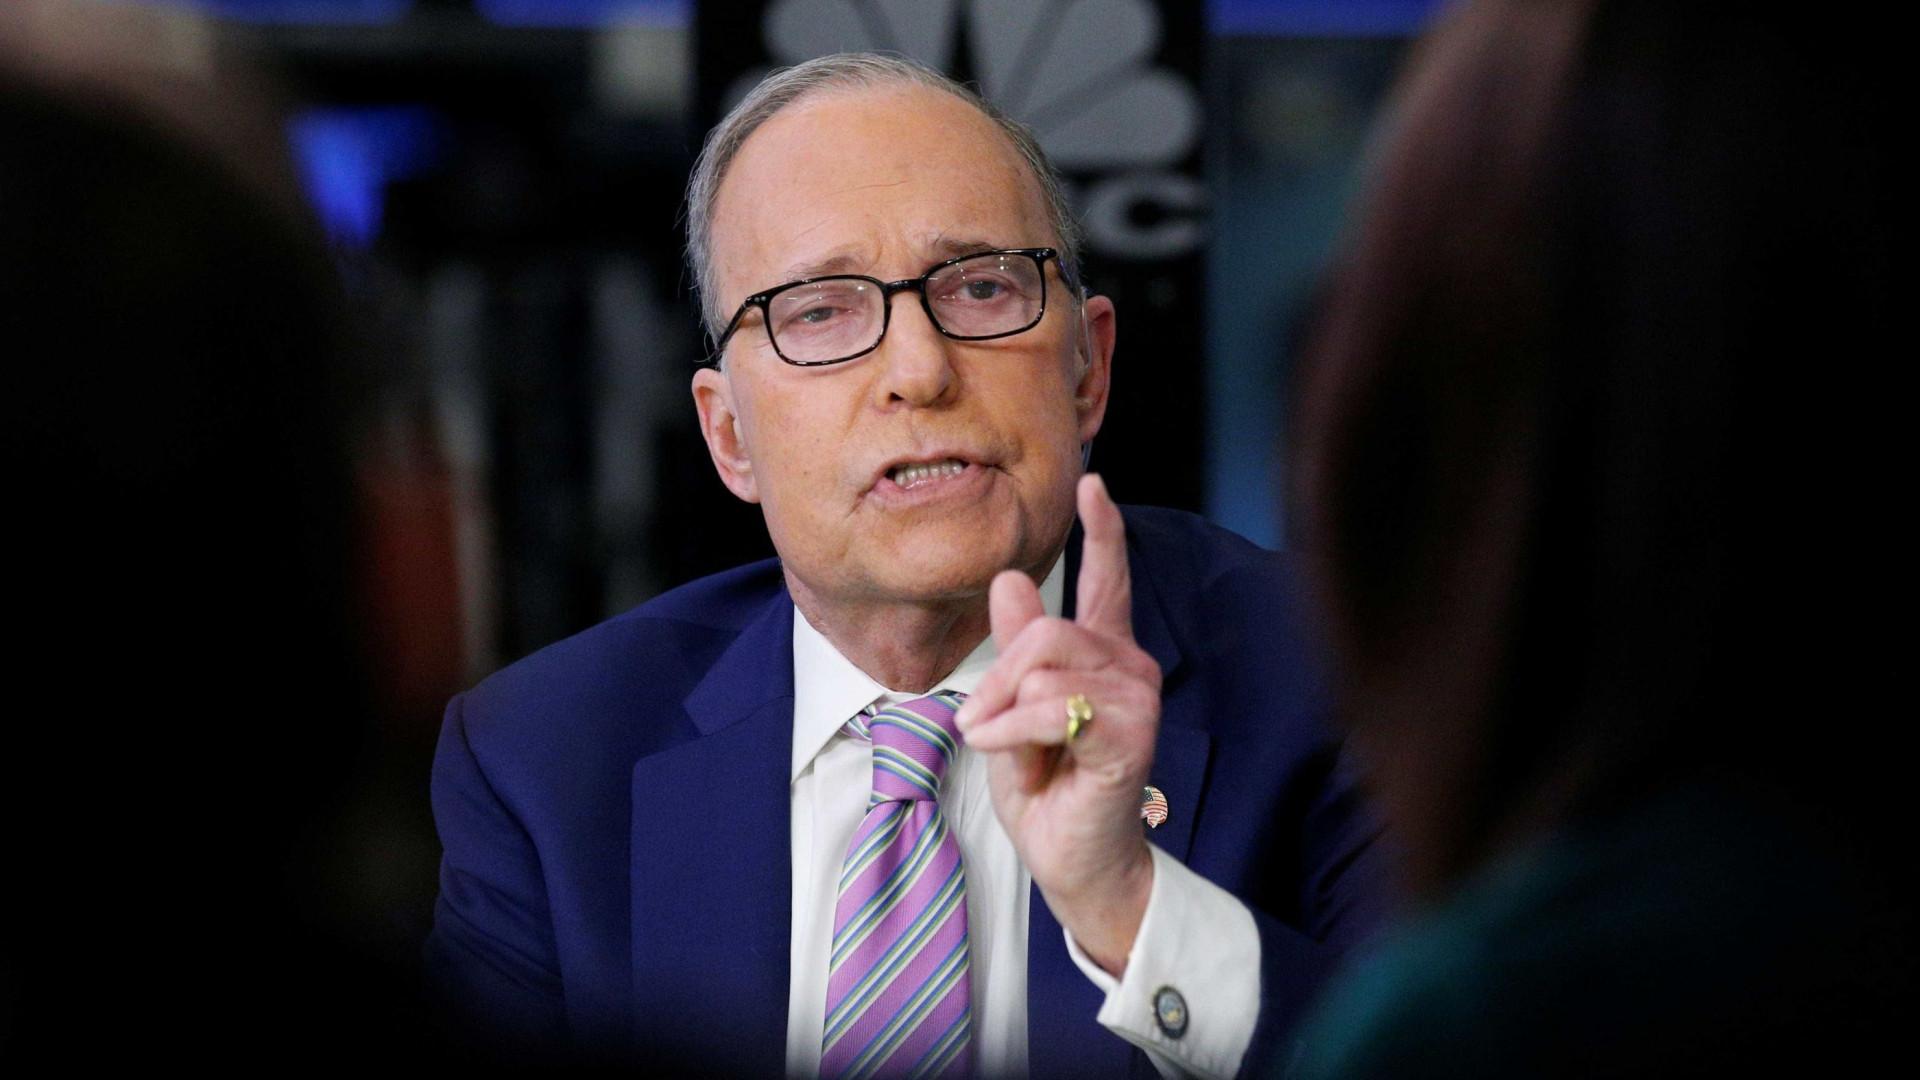 Jornalista Larry Kudlow aceita convite de Trump para ser seu conselheiro